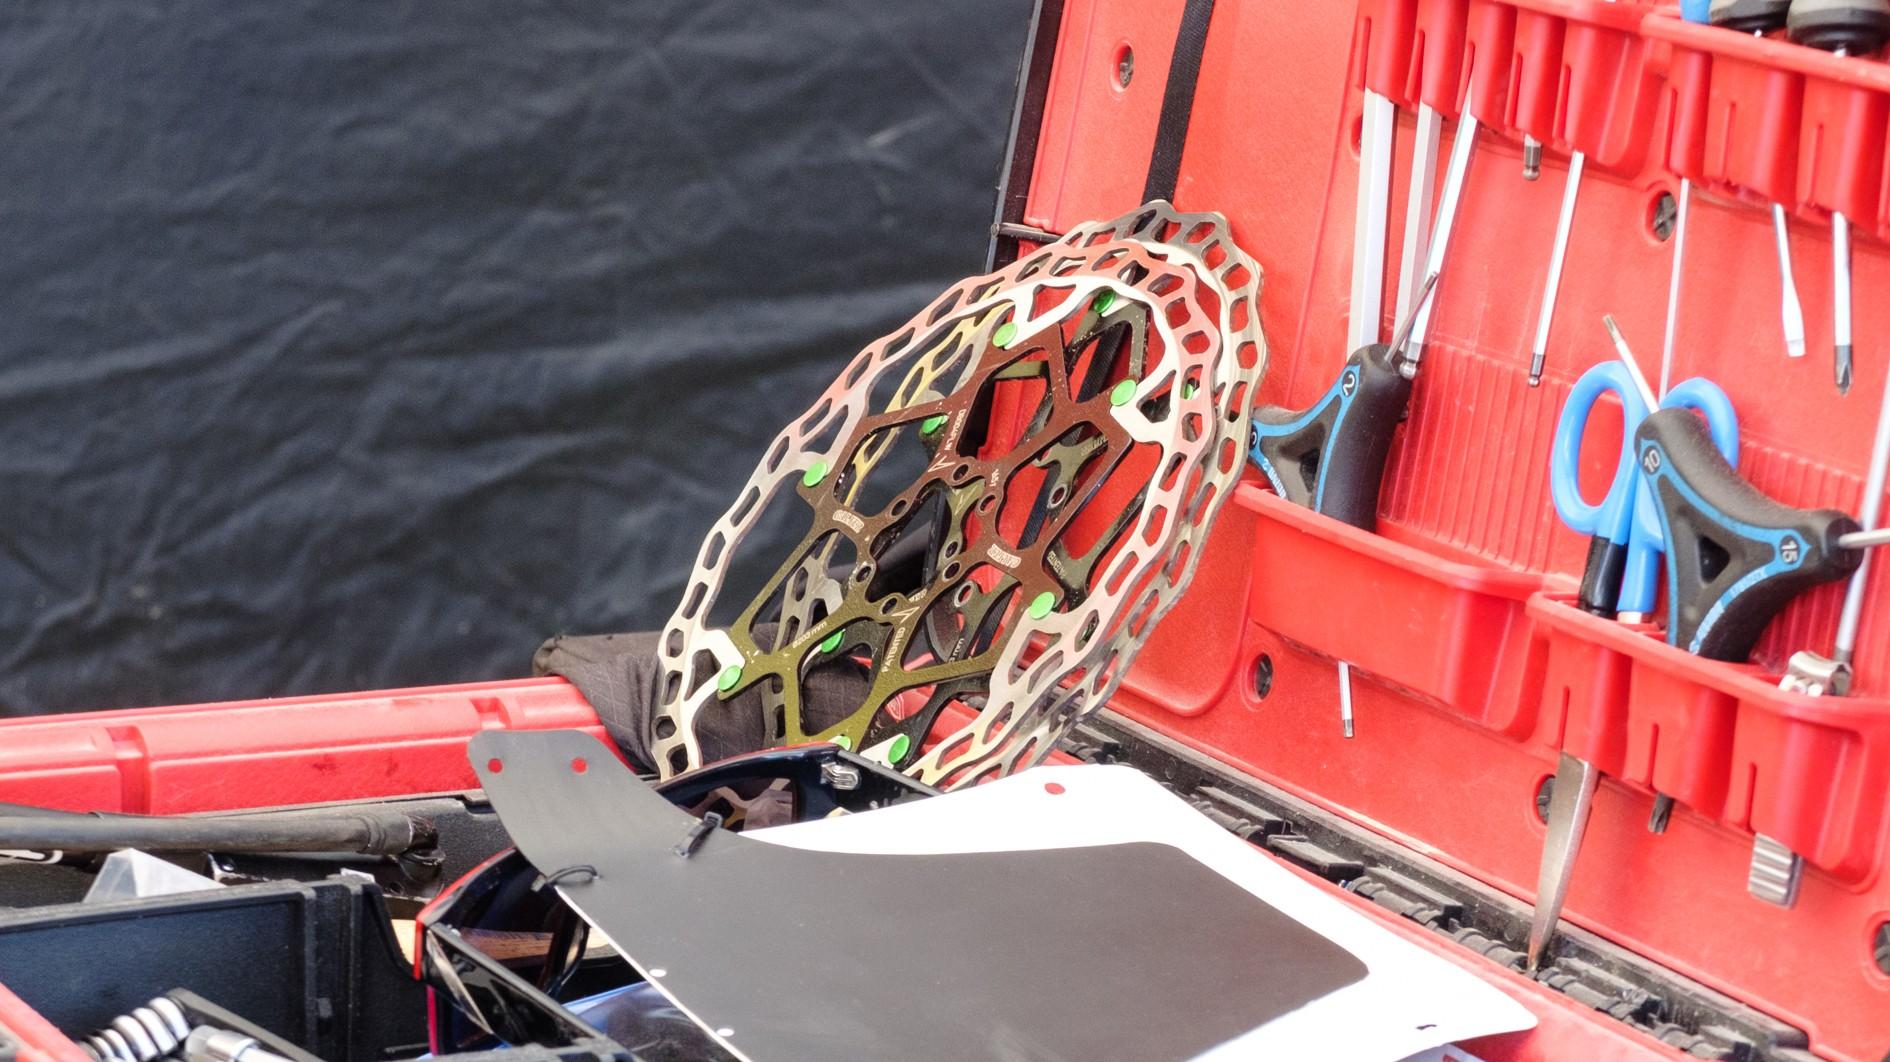 The whole team uses Trickstuff Diritessima brakes